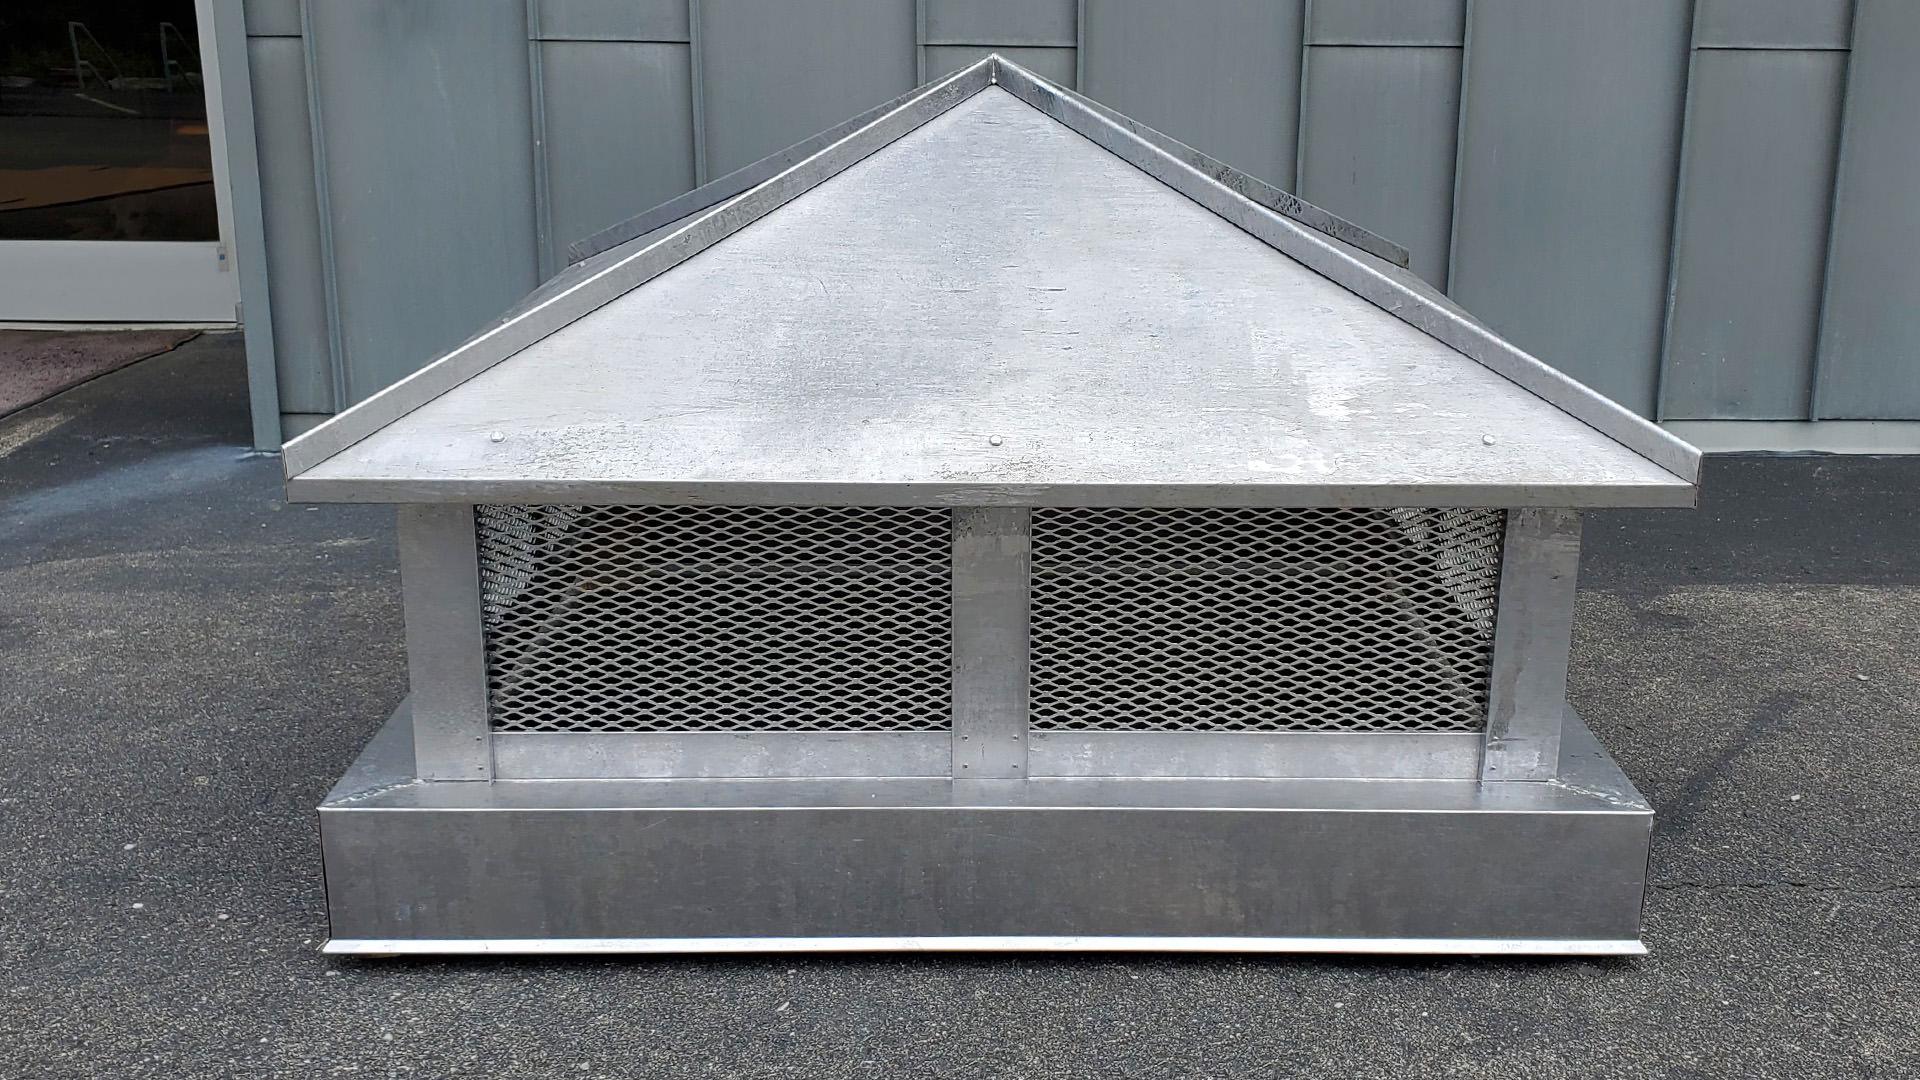 CC103 - Lead coated copper hip and ridge metal chimney cap